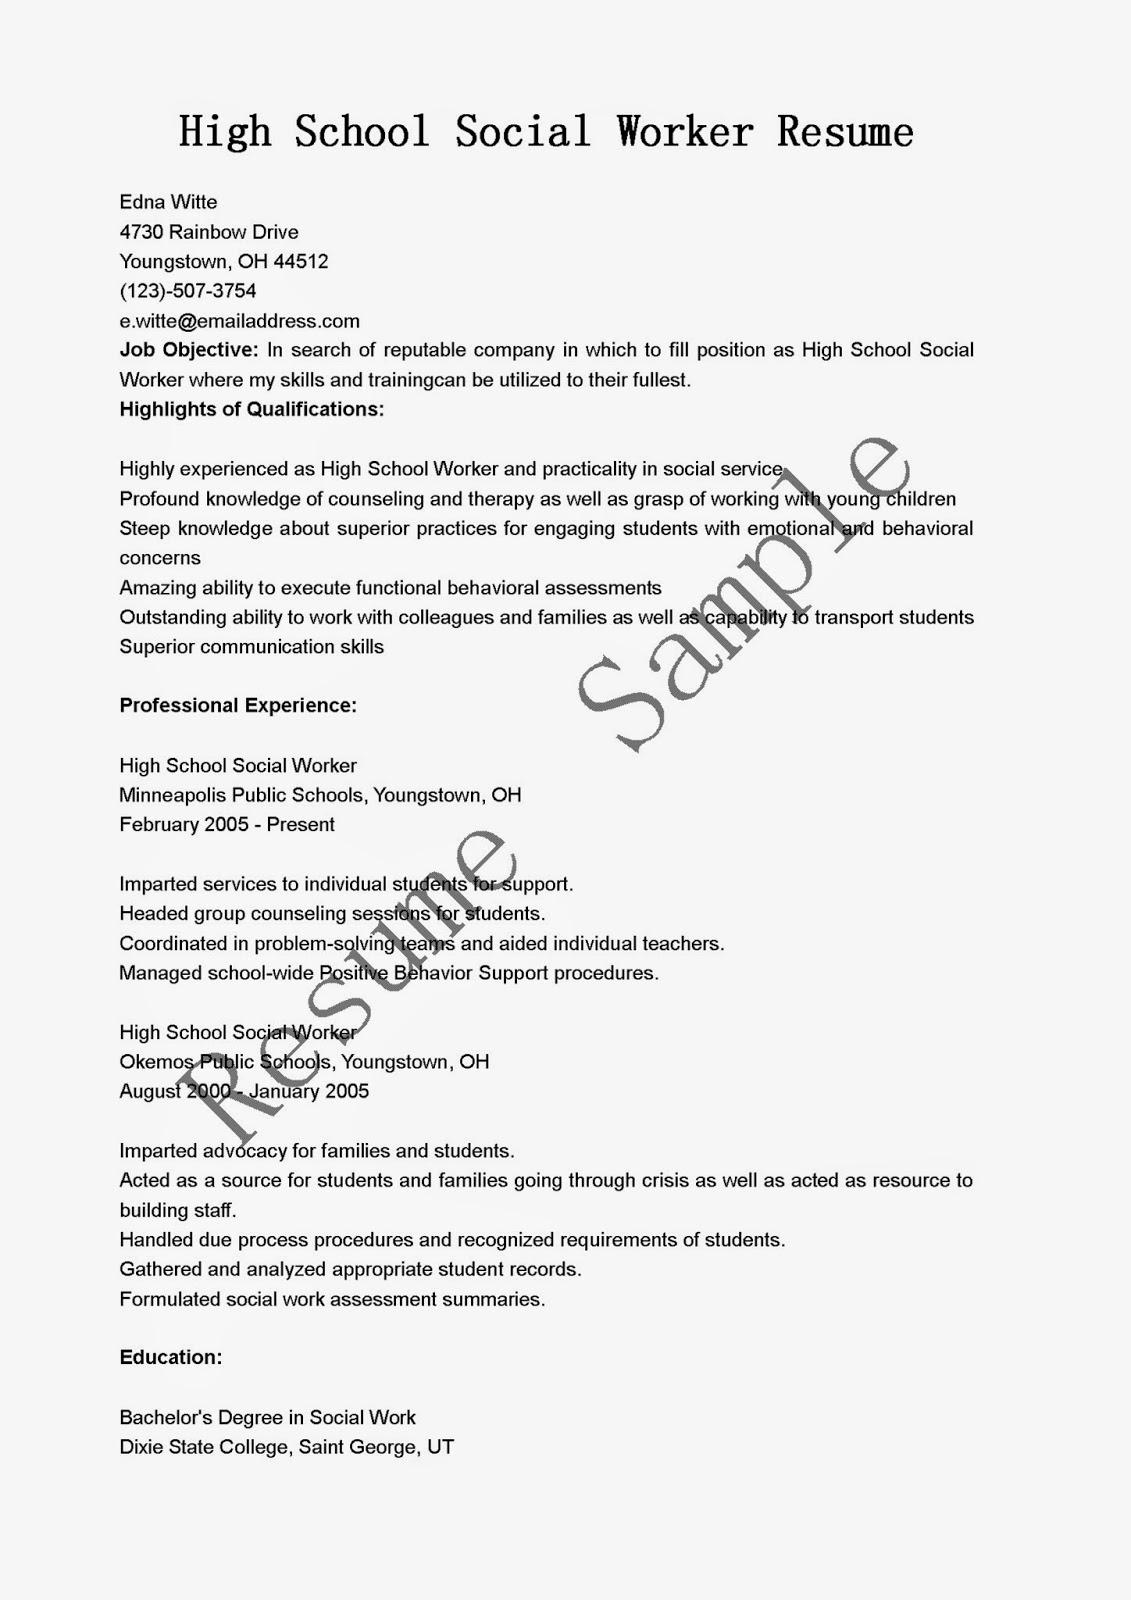 Ted Kaczynski Wikipedia the free encyclopedia sample resume and